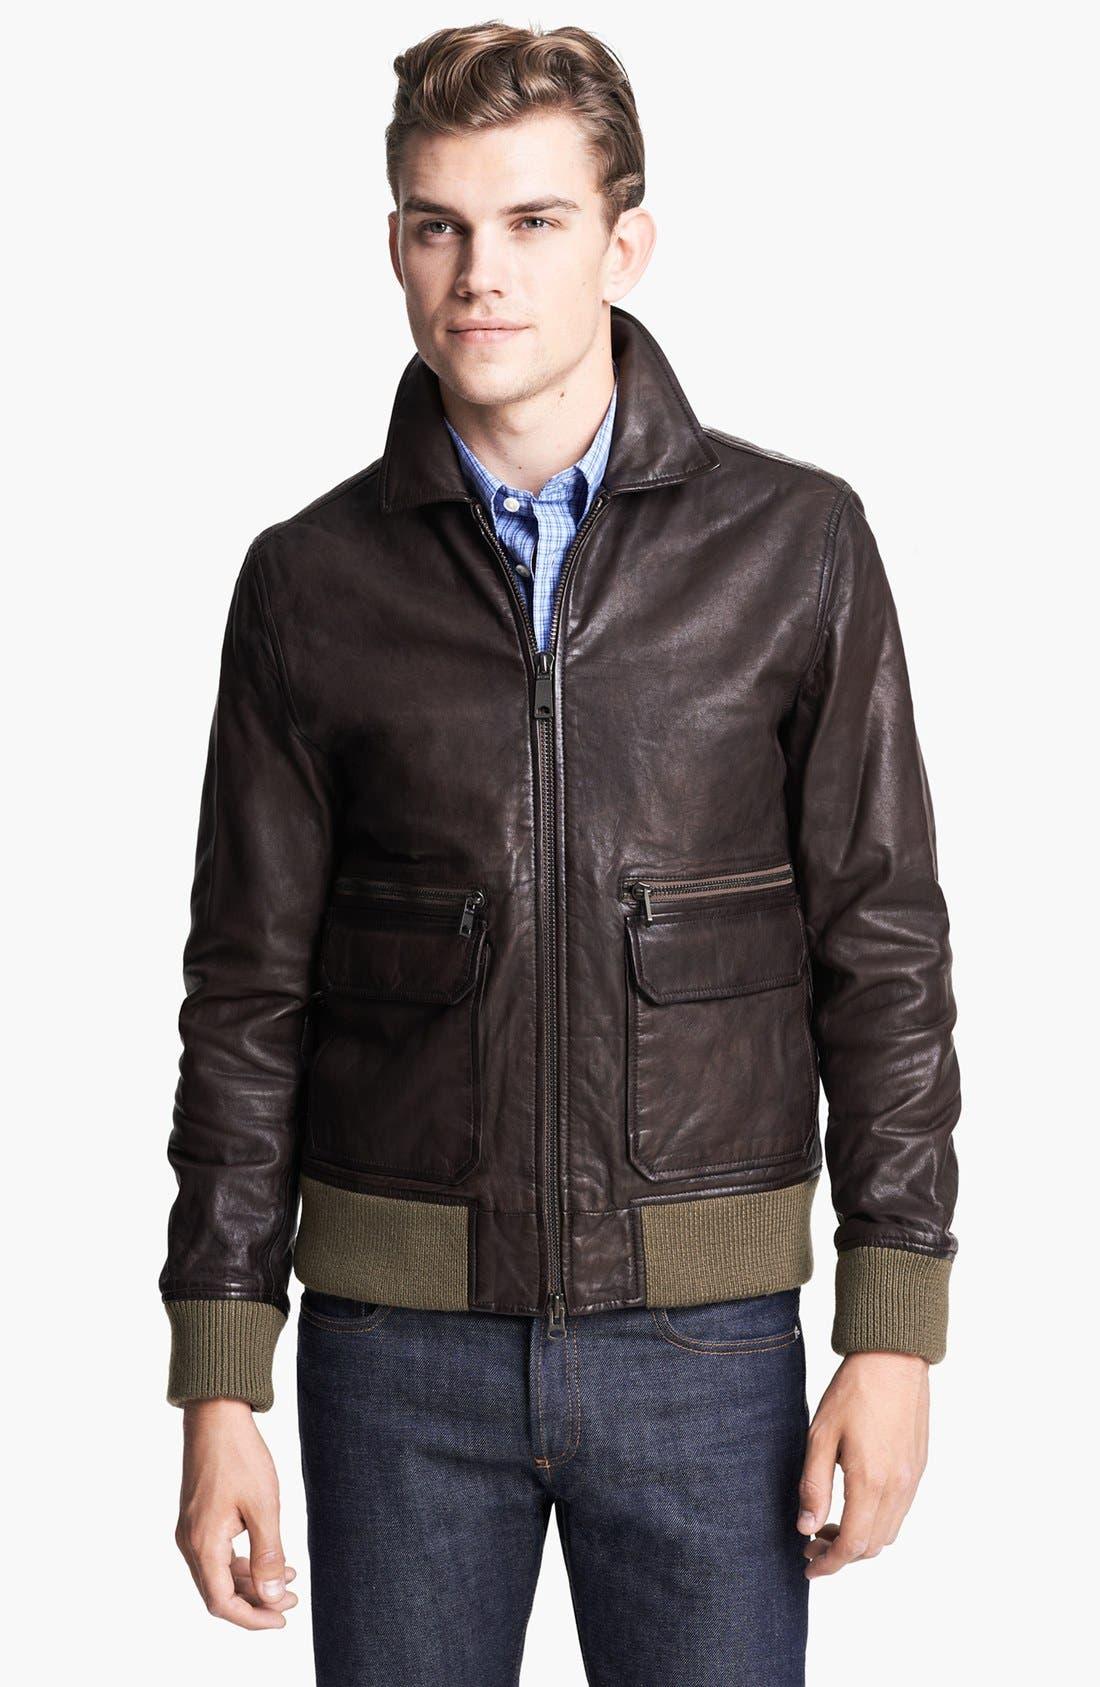 JACK SPADE, 'Huxley' Leather Bomber Jacket, Main thumbnail 1, color, 200